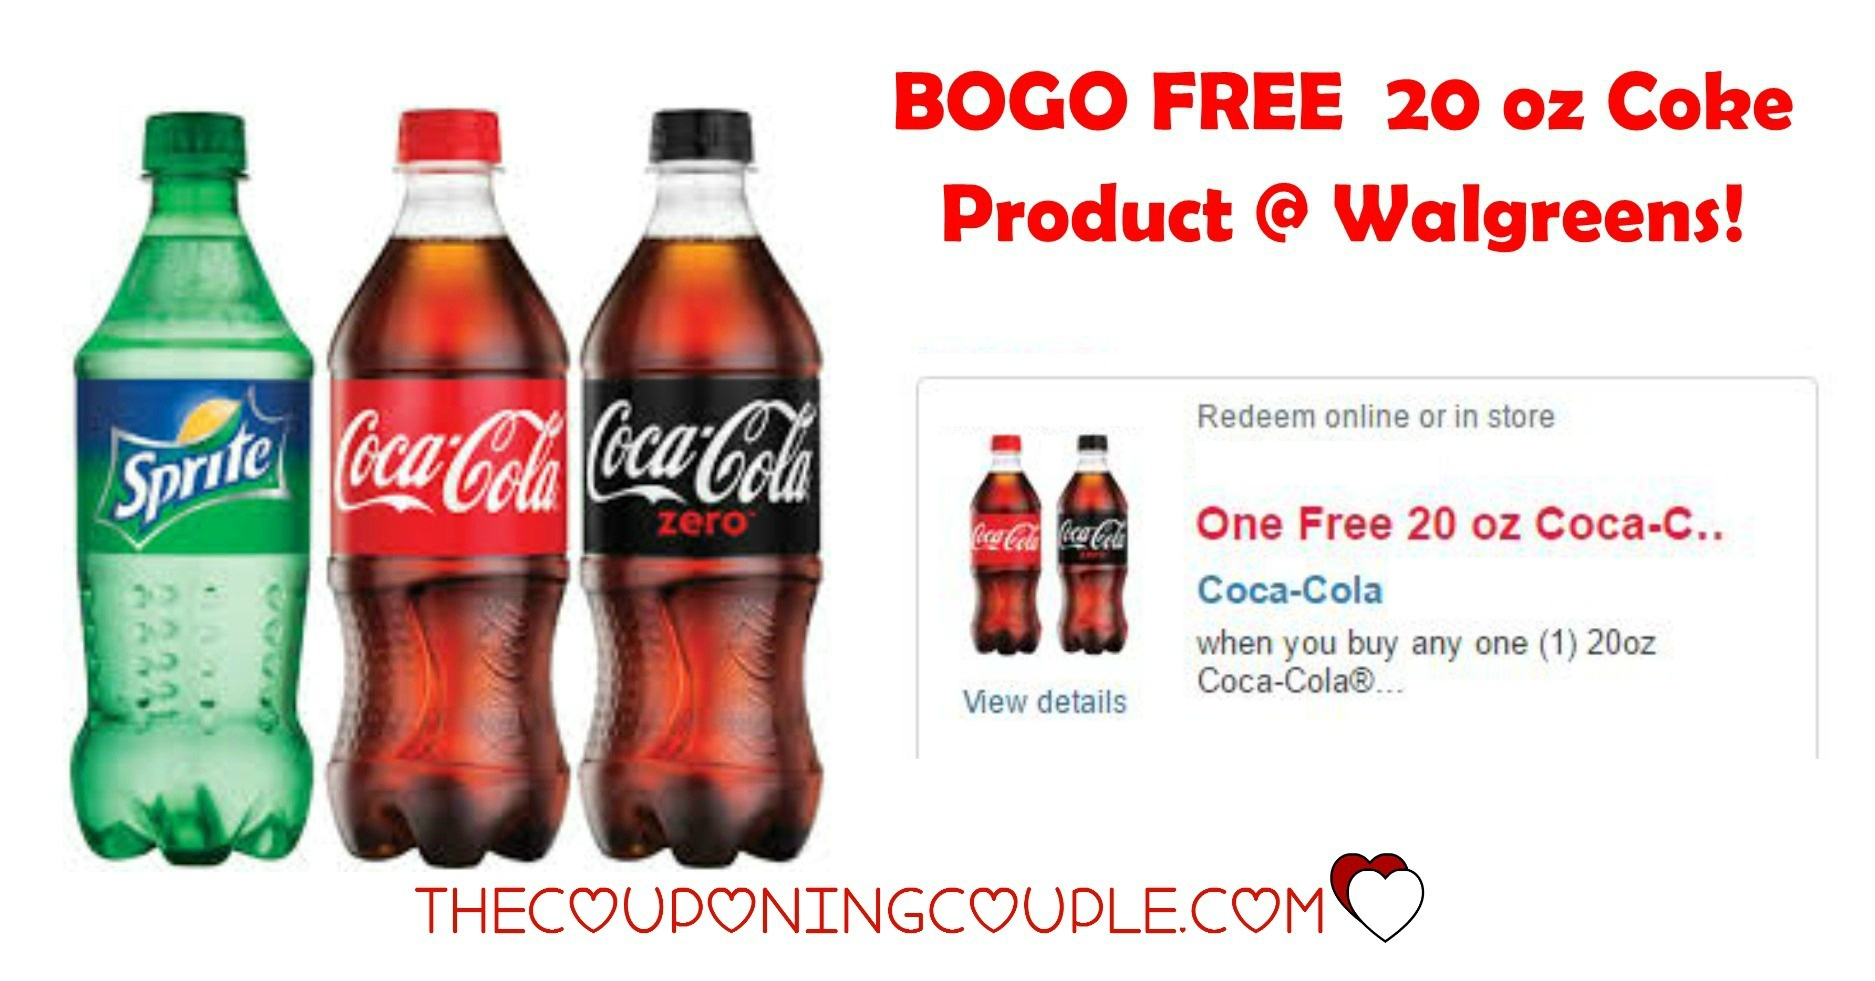 Bogo Free 20 Oz Coke Ecoupon @ Walgreens! Through 6/28! - Free Printable Coupons For Coca Cola Products